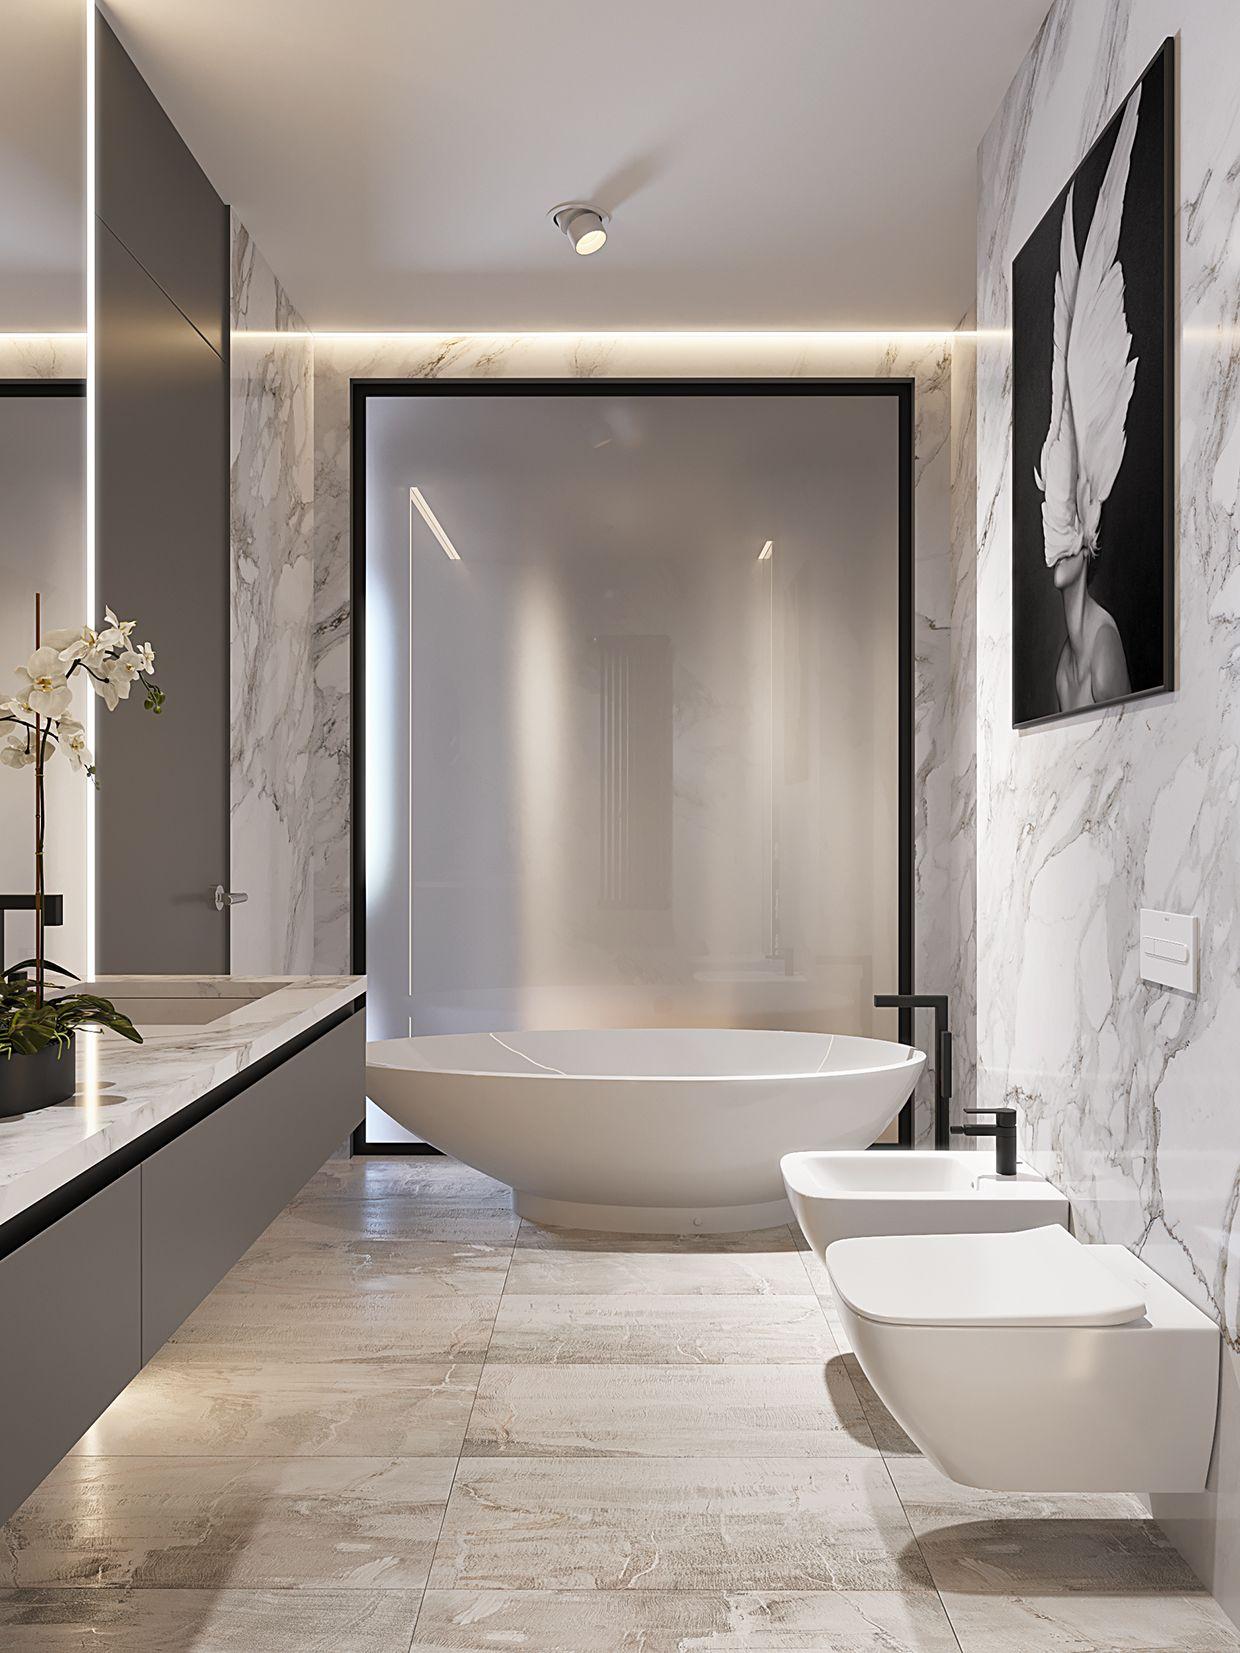 878fa851584251.58f338e3b6bc4.jpg (1240×1653) | Bathroom | Pinterest